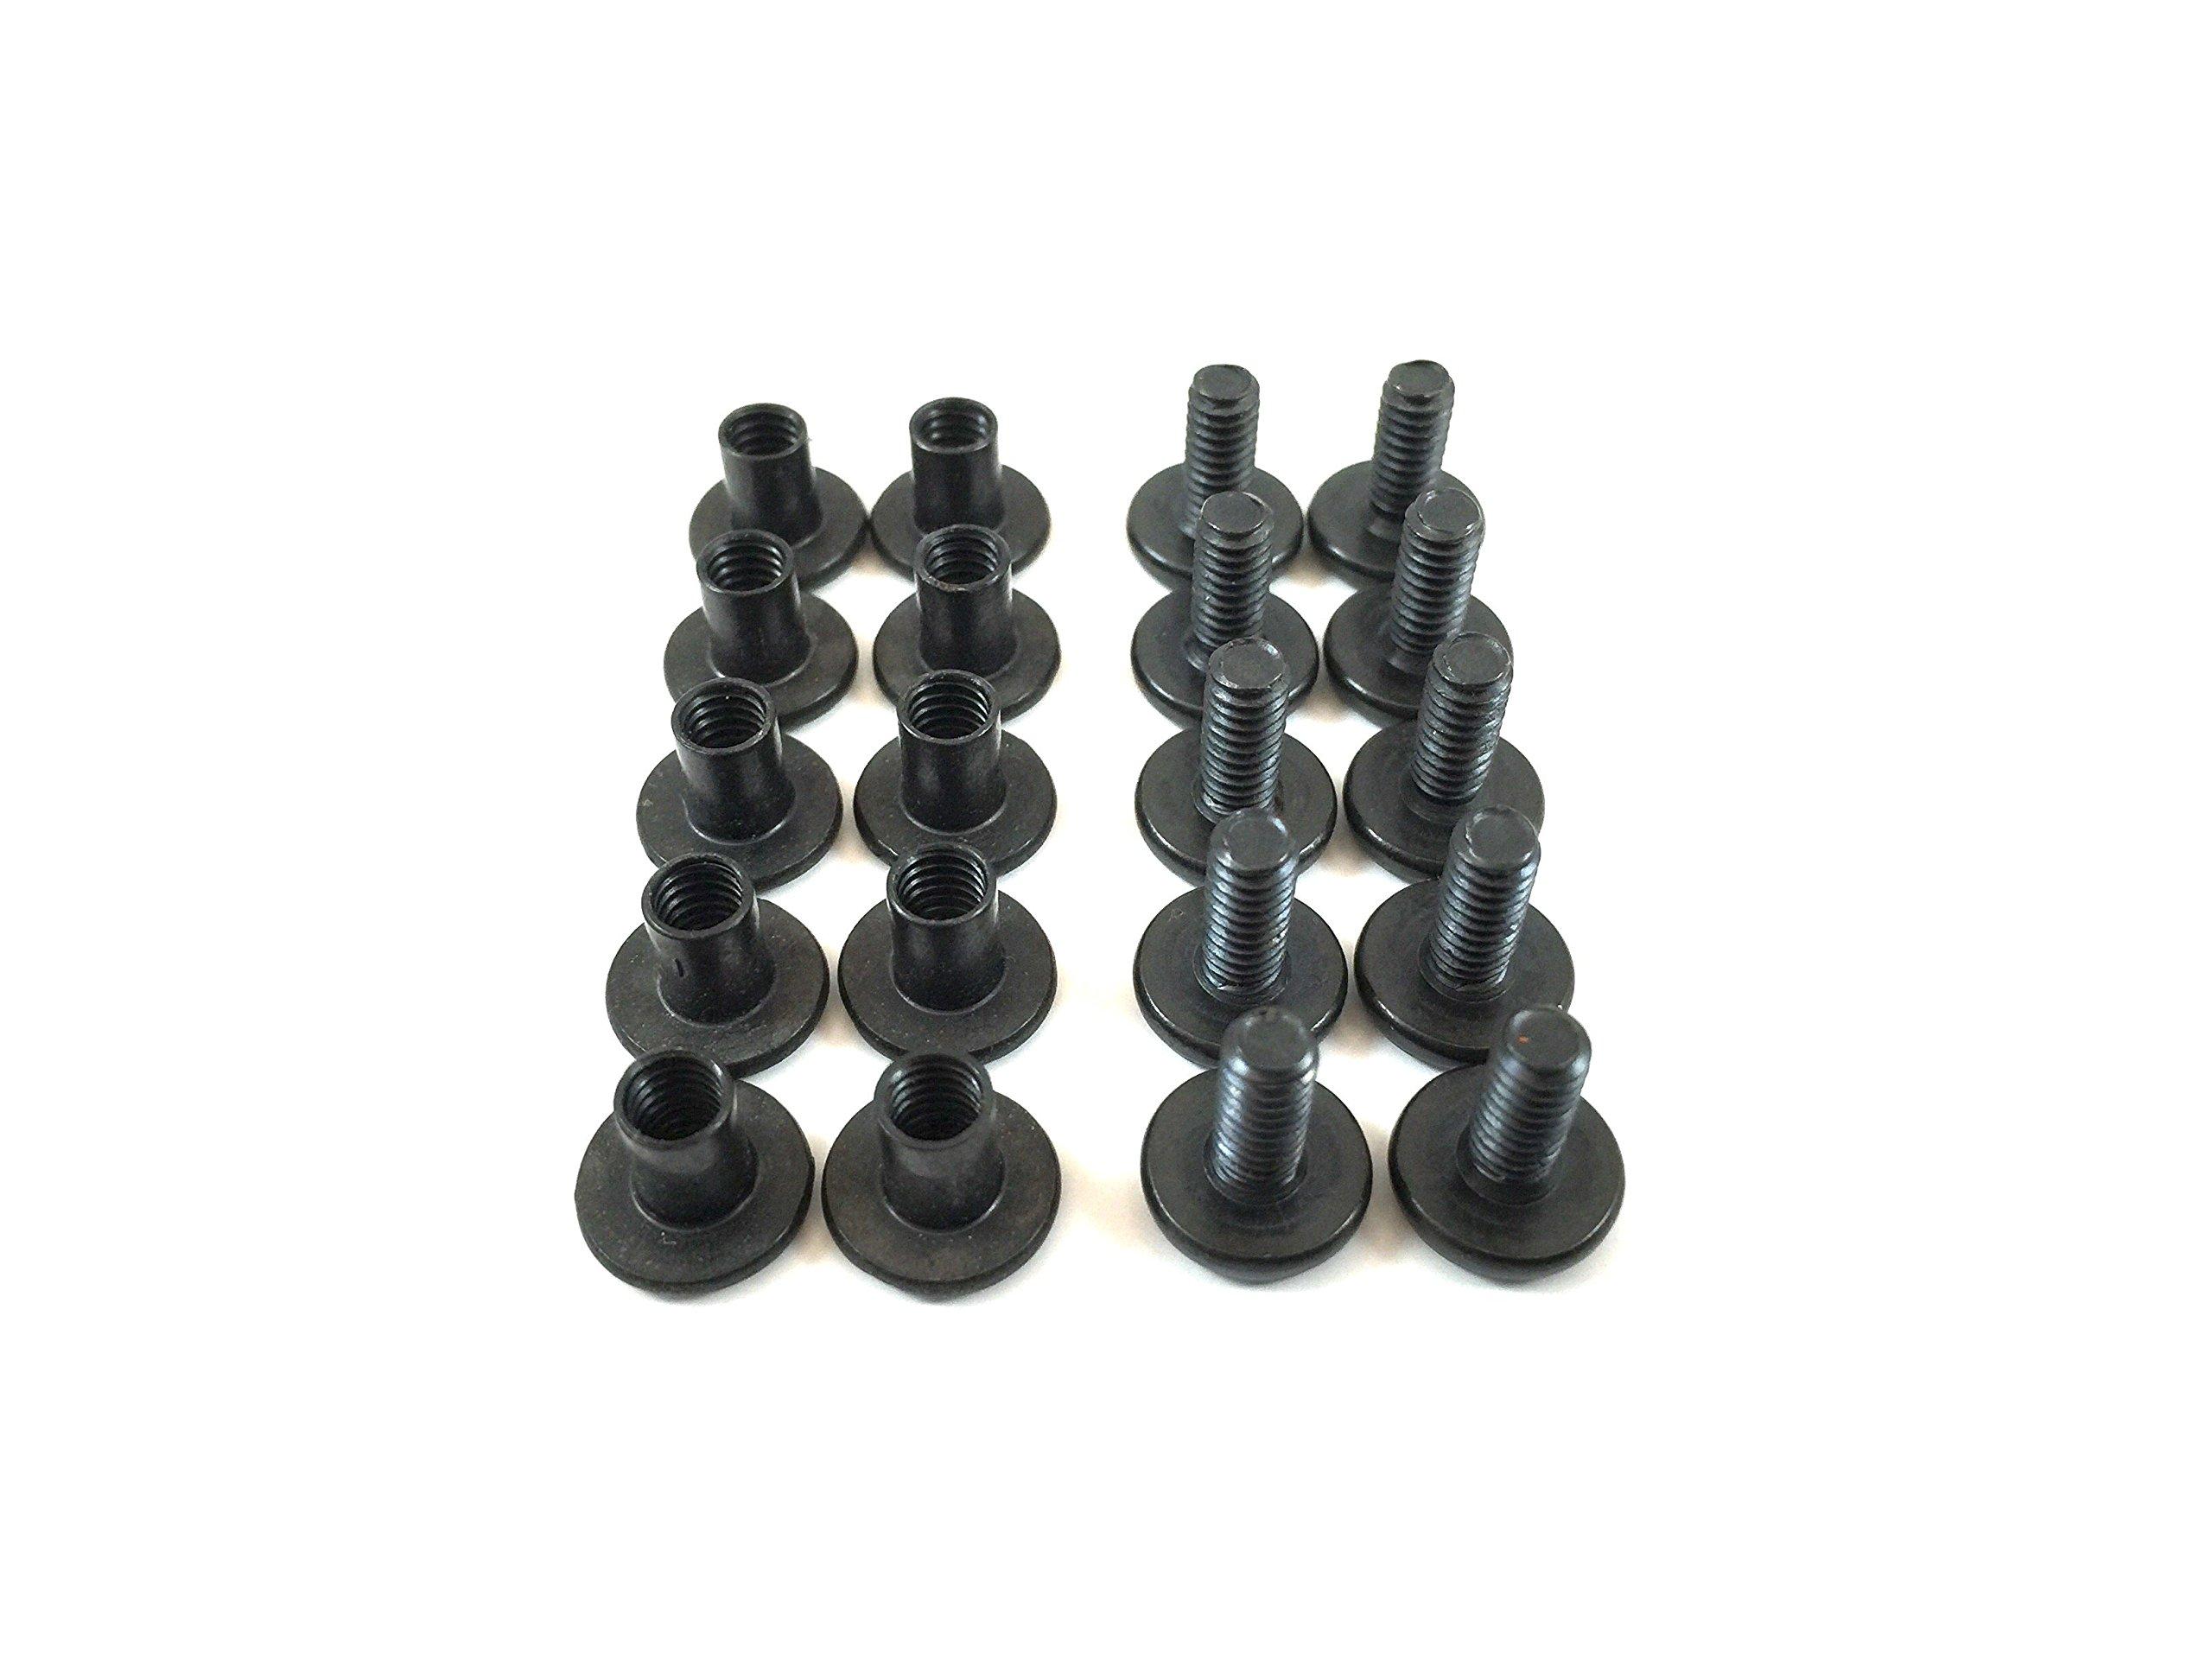 Gun Guy Gear Holster Screws - Chicago Screws - Leathercraft - Black Finish - 10 Pk (1/4'' - Two 10 Packs)